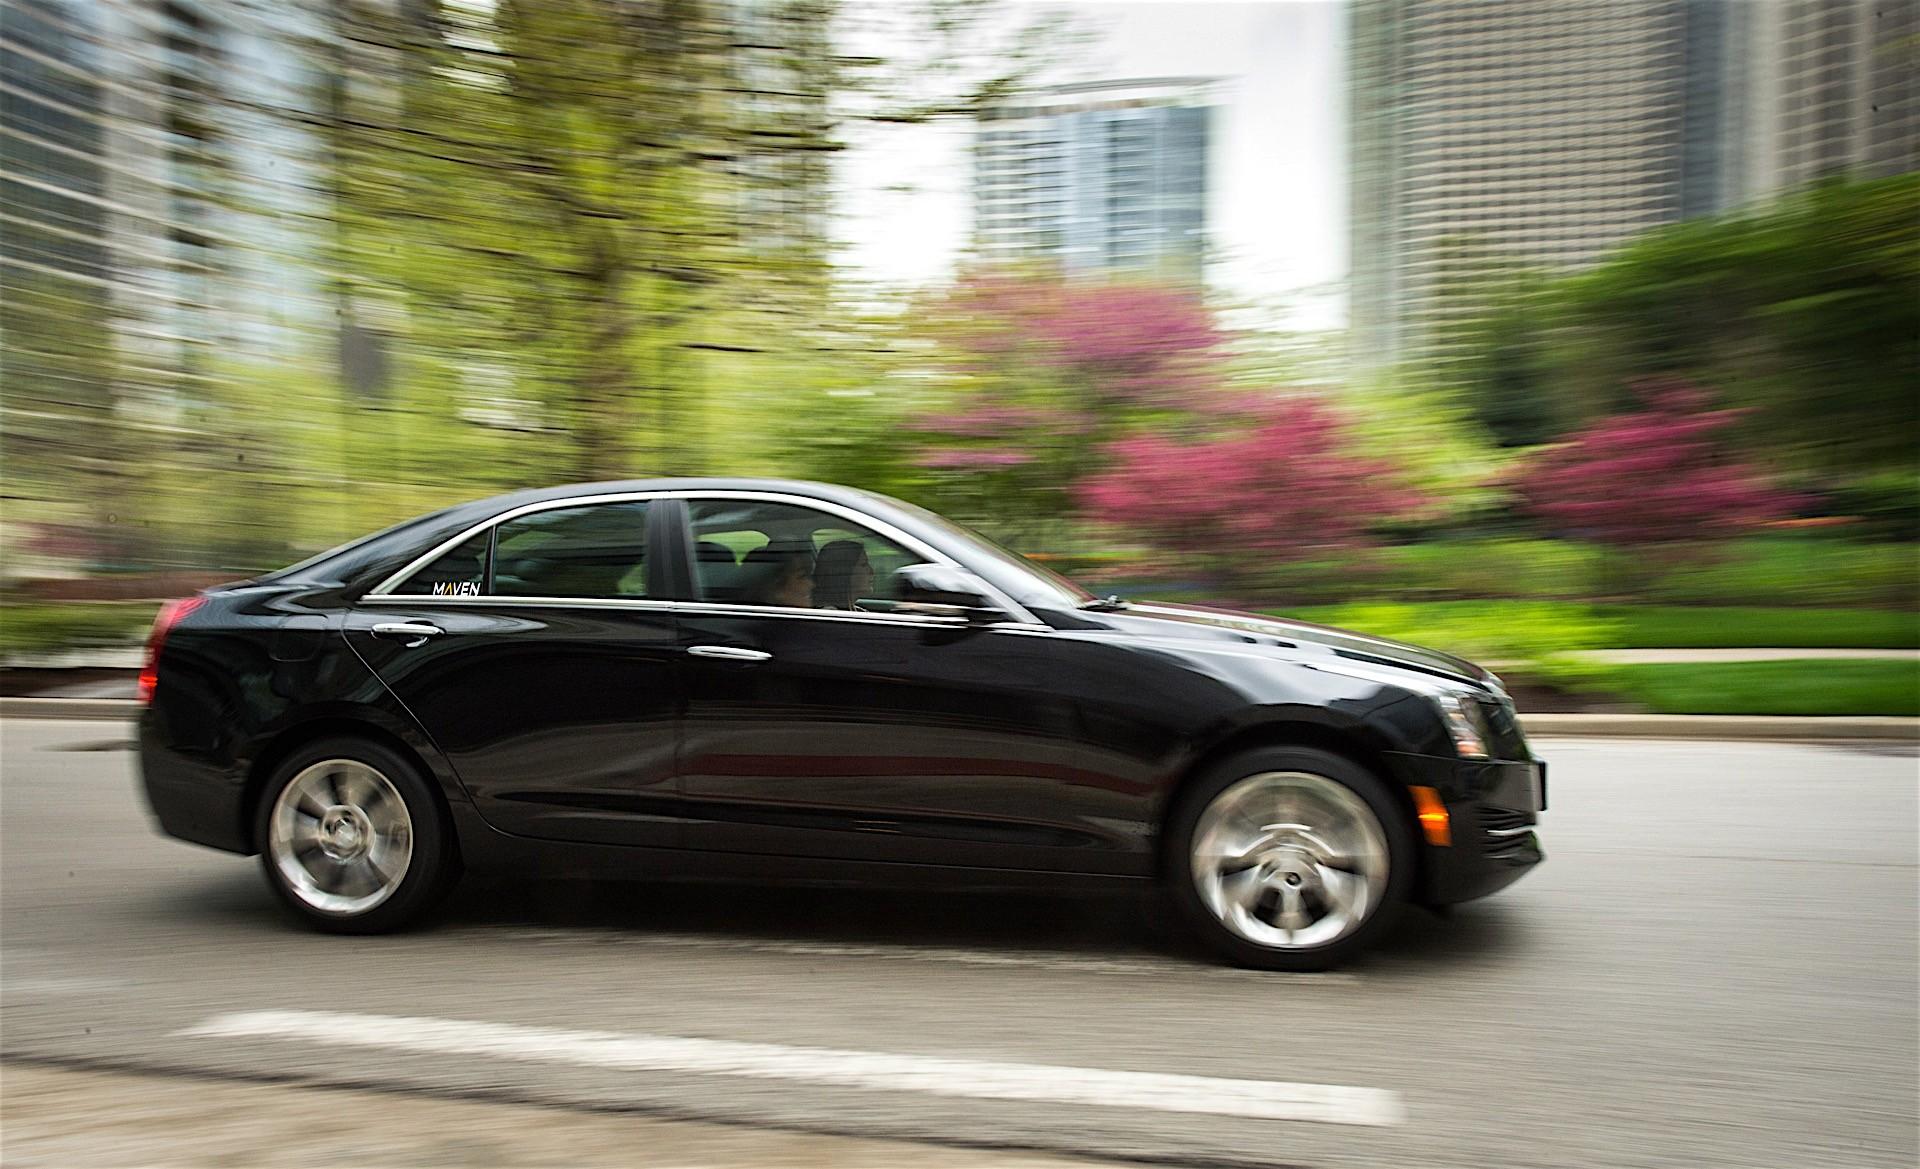 GM's Maven Car Sharing Program Reaches 1 Million Miles